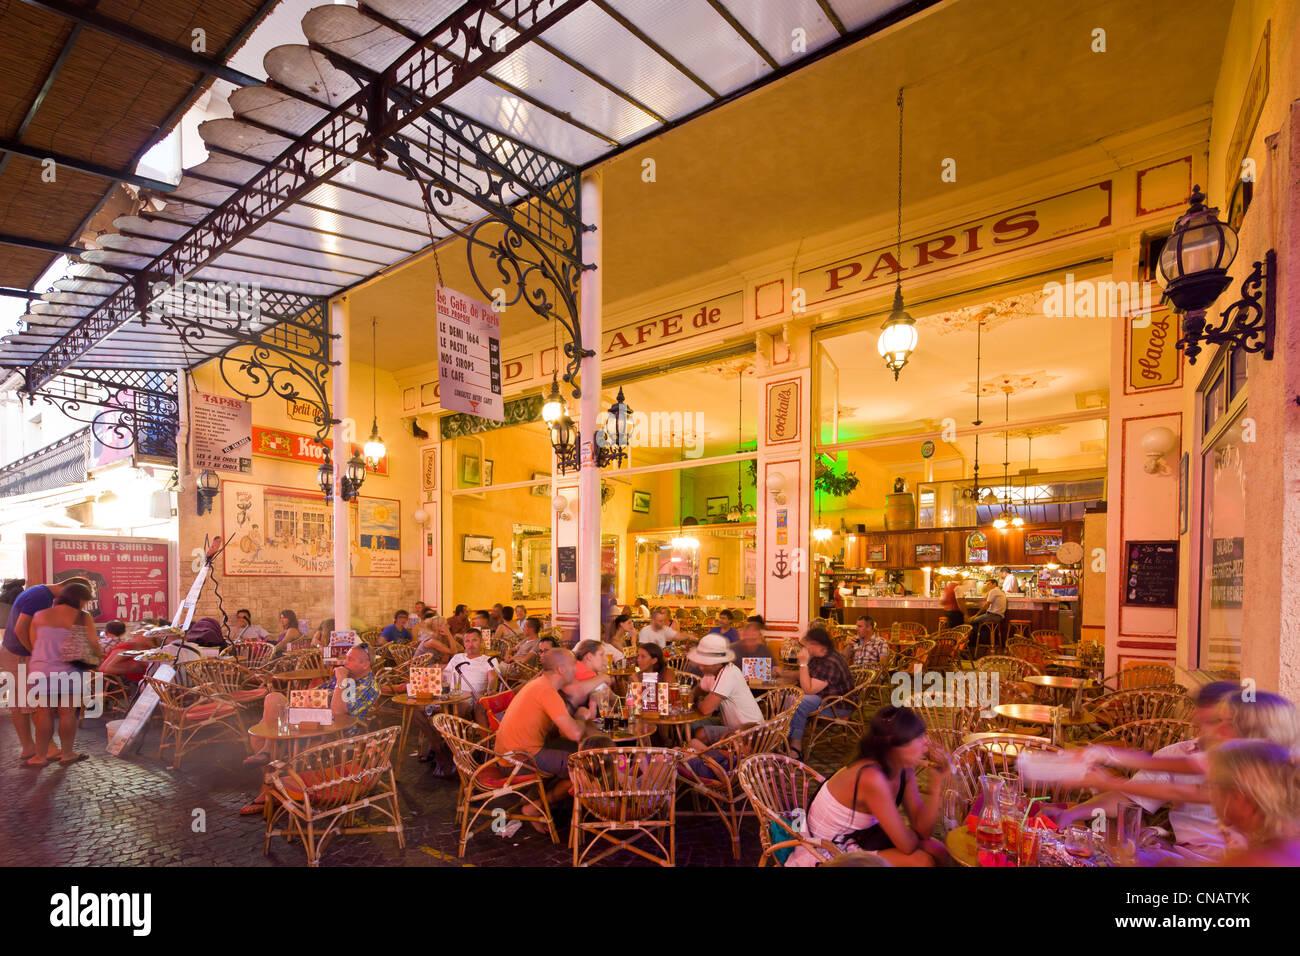 Restaurant Au Port Camargue